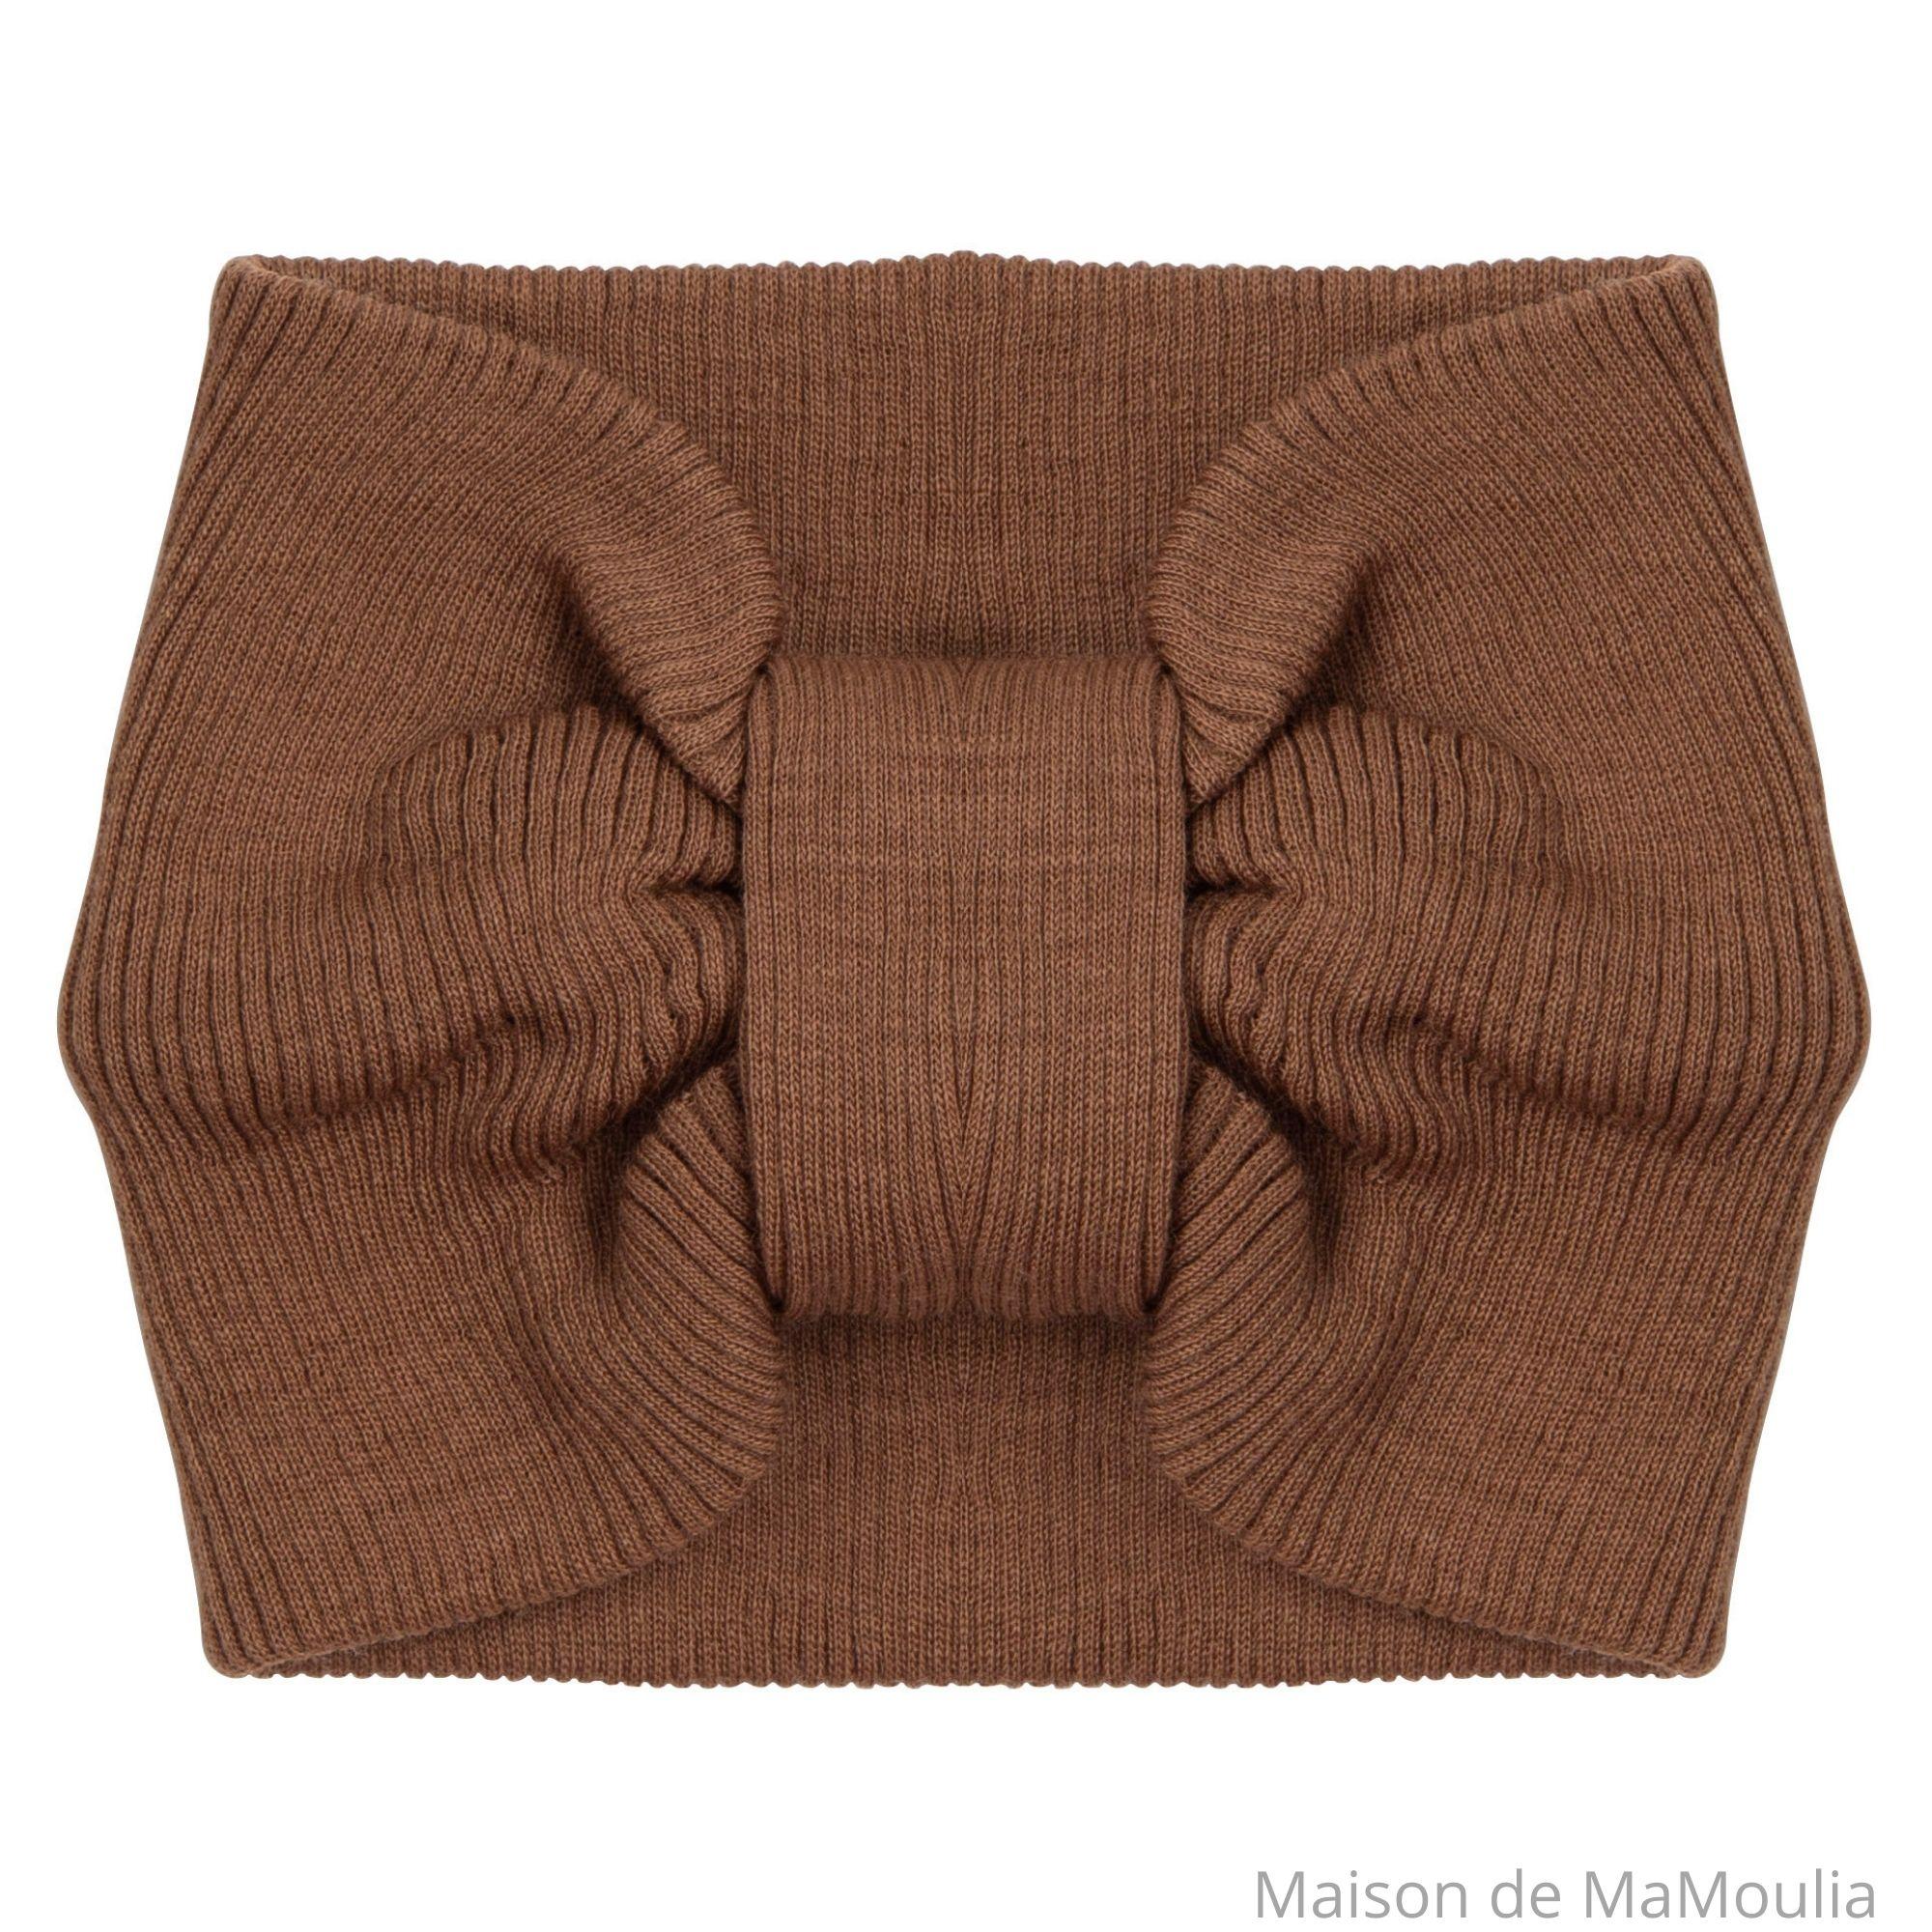 headband-bandeau-serre-tete-femme-pure-laine-merinos-minimalisma-maison-de-mamoulia-caramel